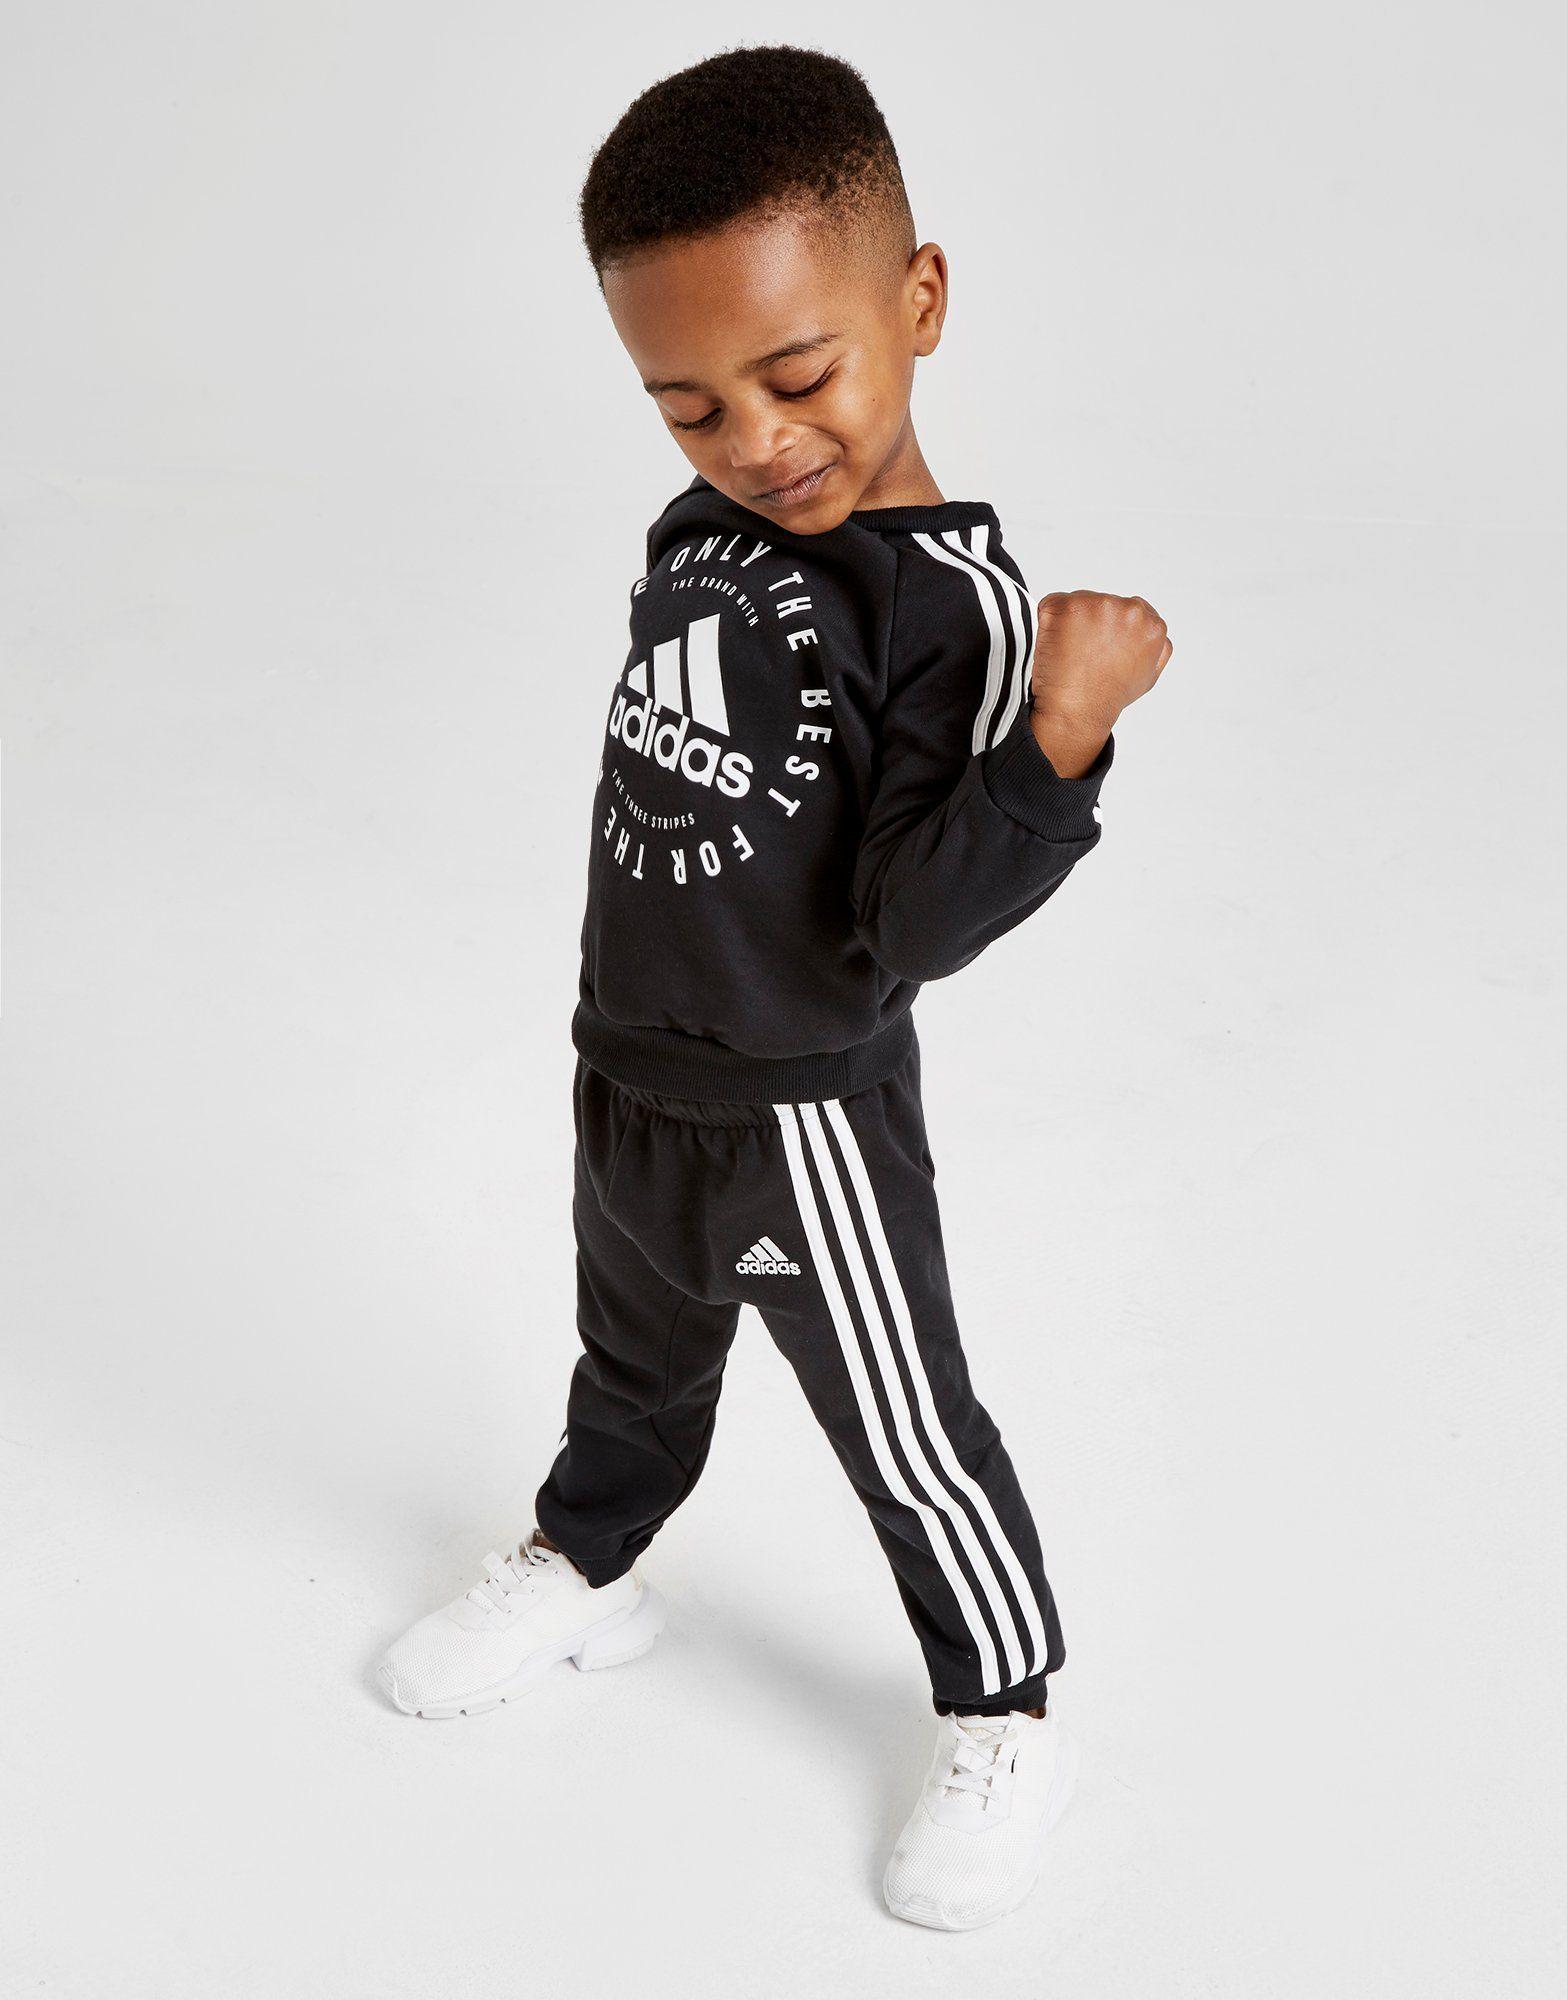 REA   Adidas Originals Gazelle   JD Sports Sverige